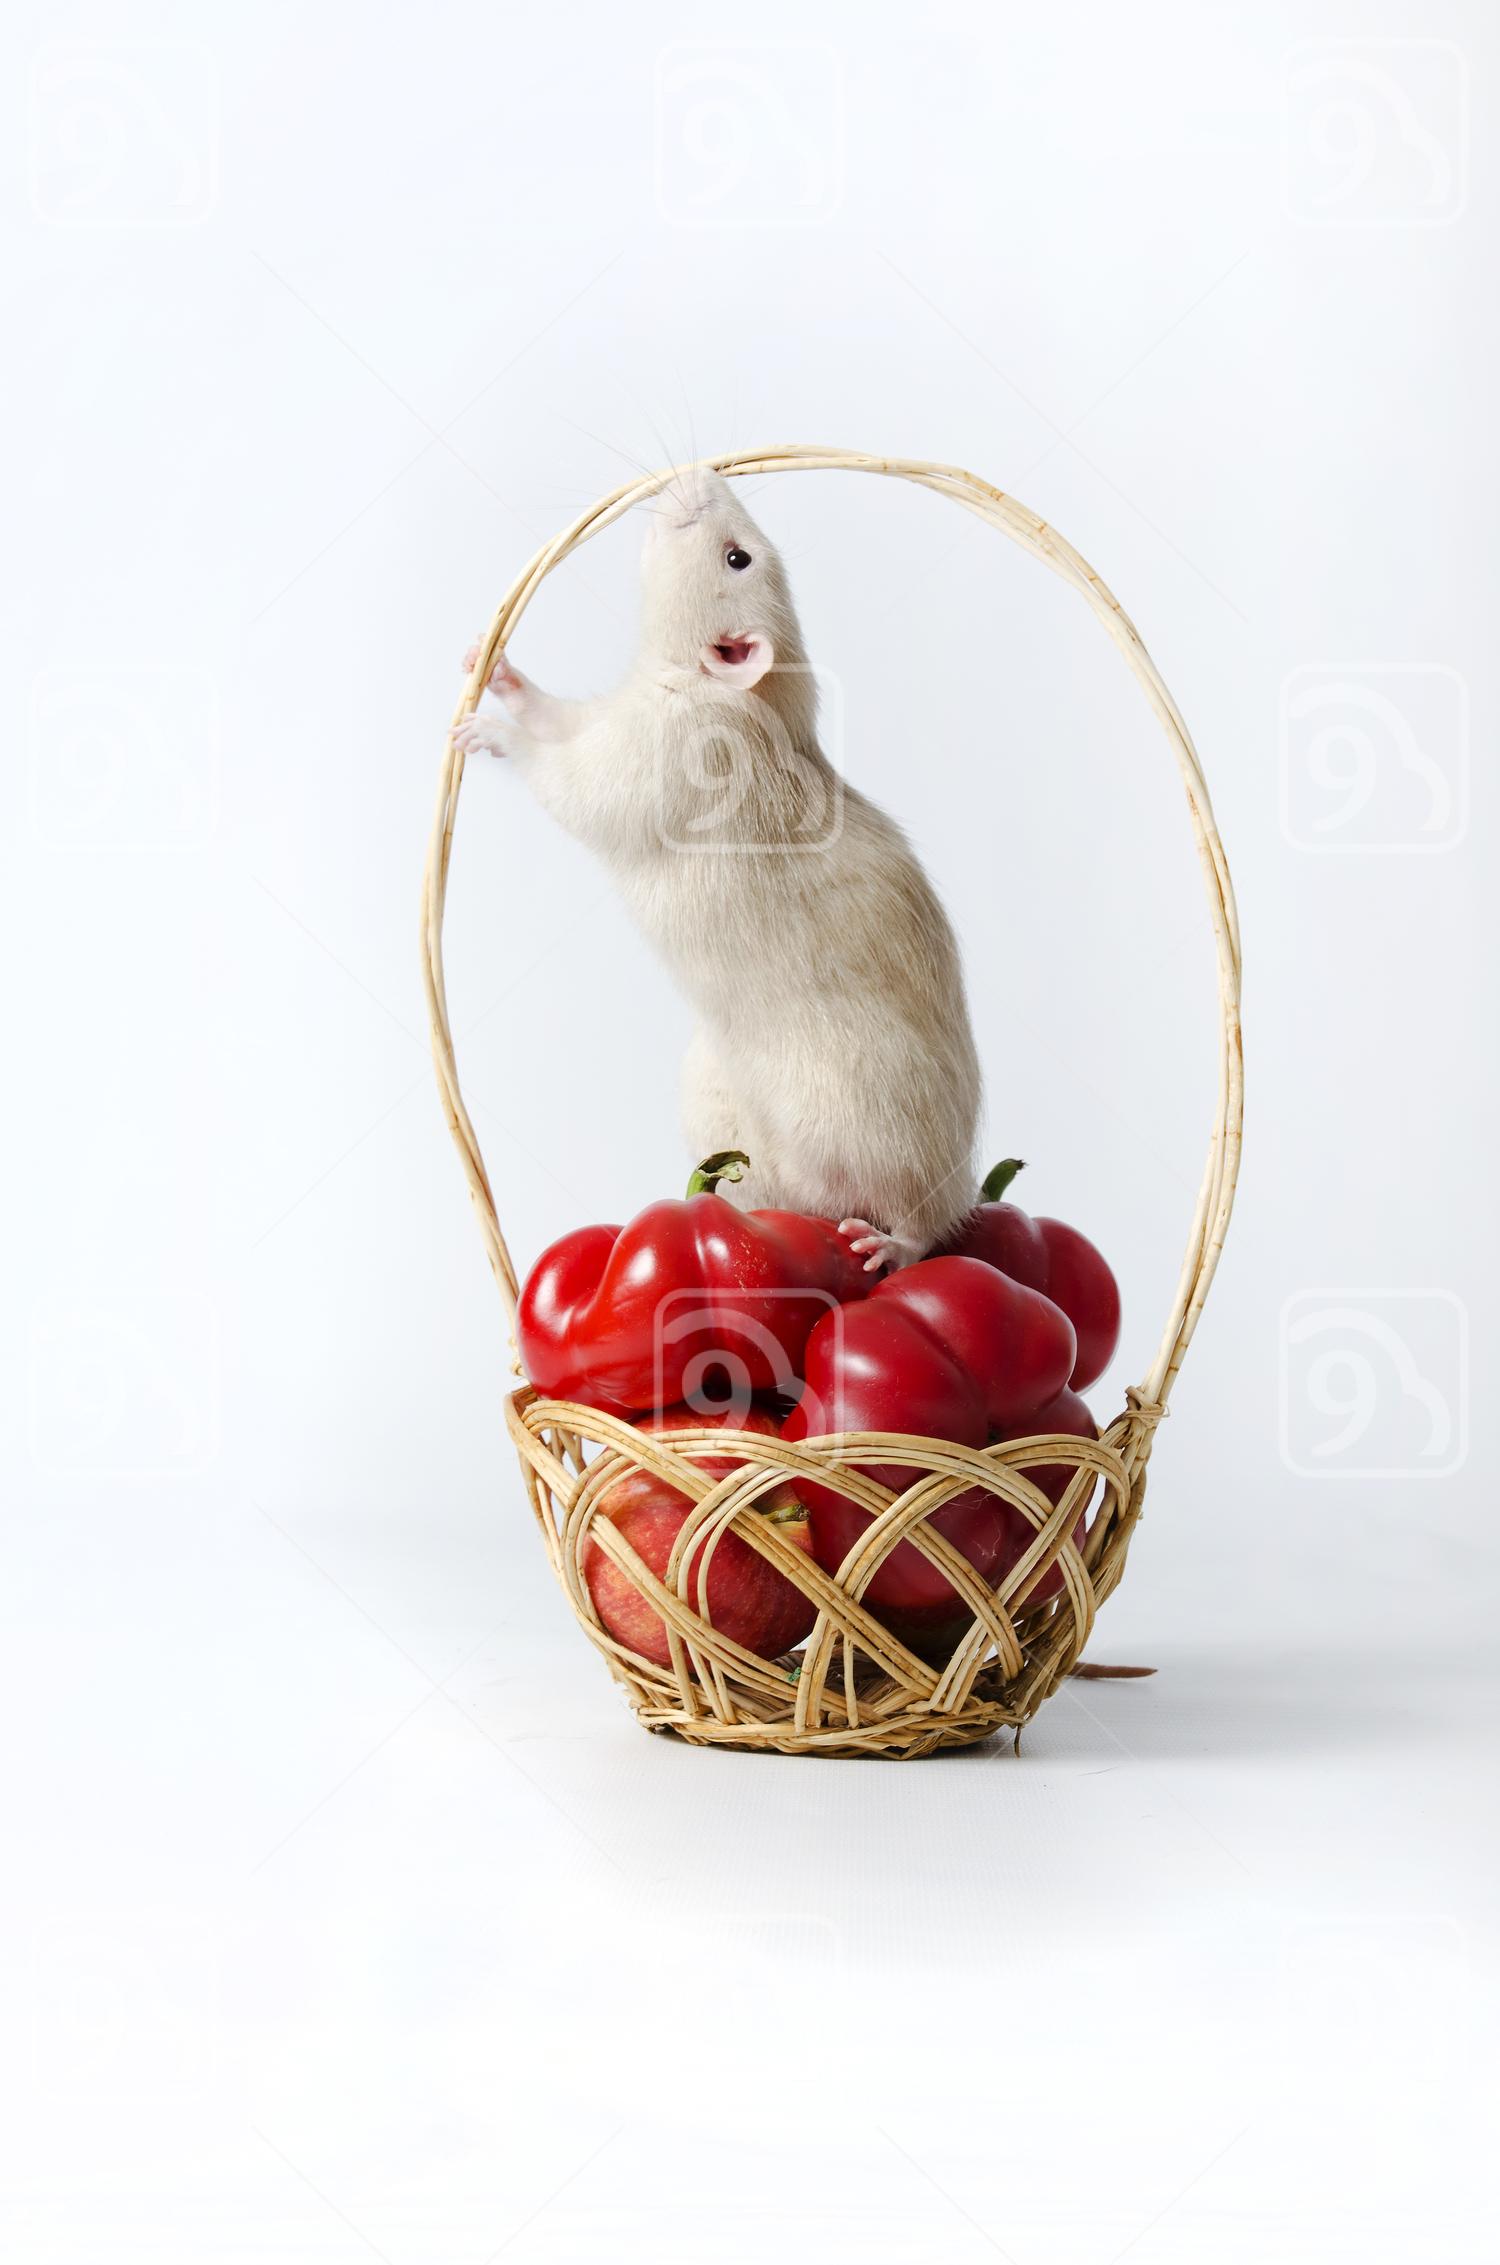 Nosy Rat on Wicker Basket